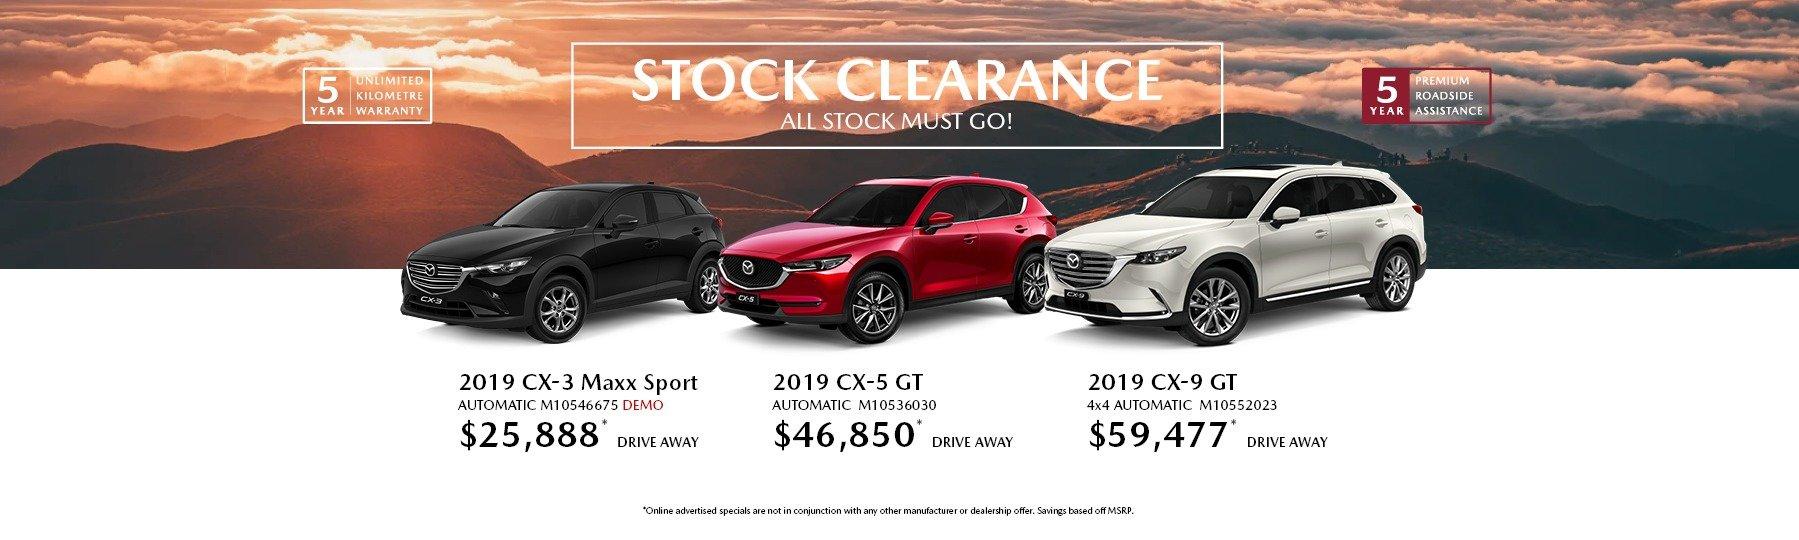 Newcastle Mazda 2019 Stock Clearance